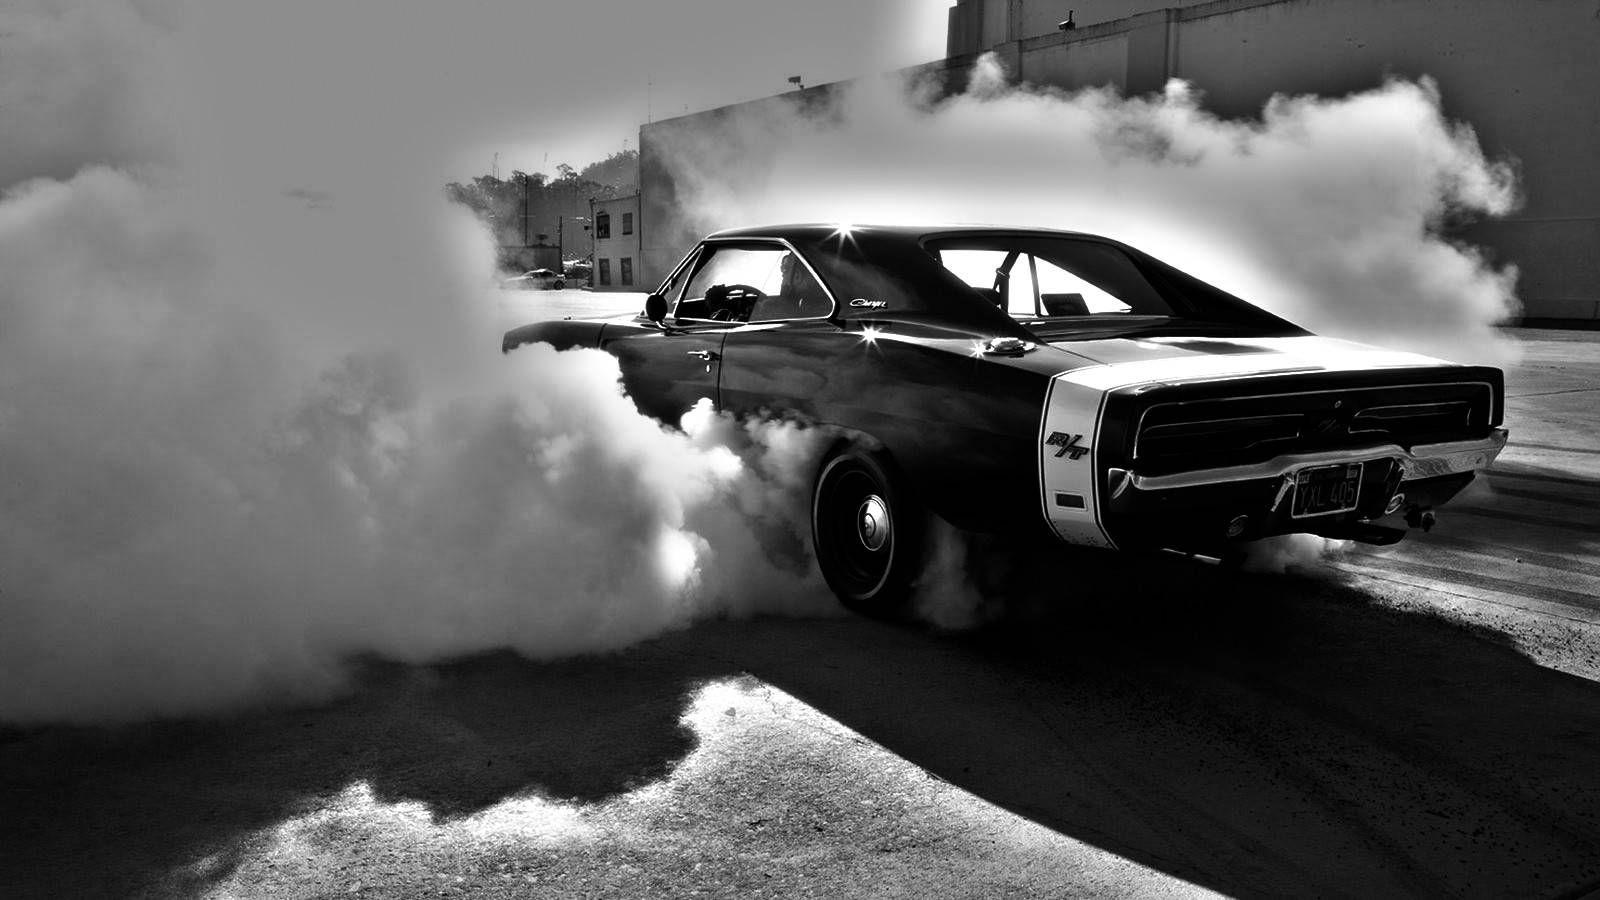 23022 Muscle Car Burnout Full Hd Pics Wallpaper Muscle Car Muscle Cars Carros